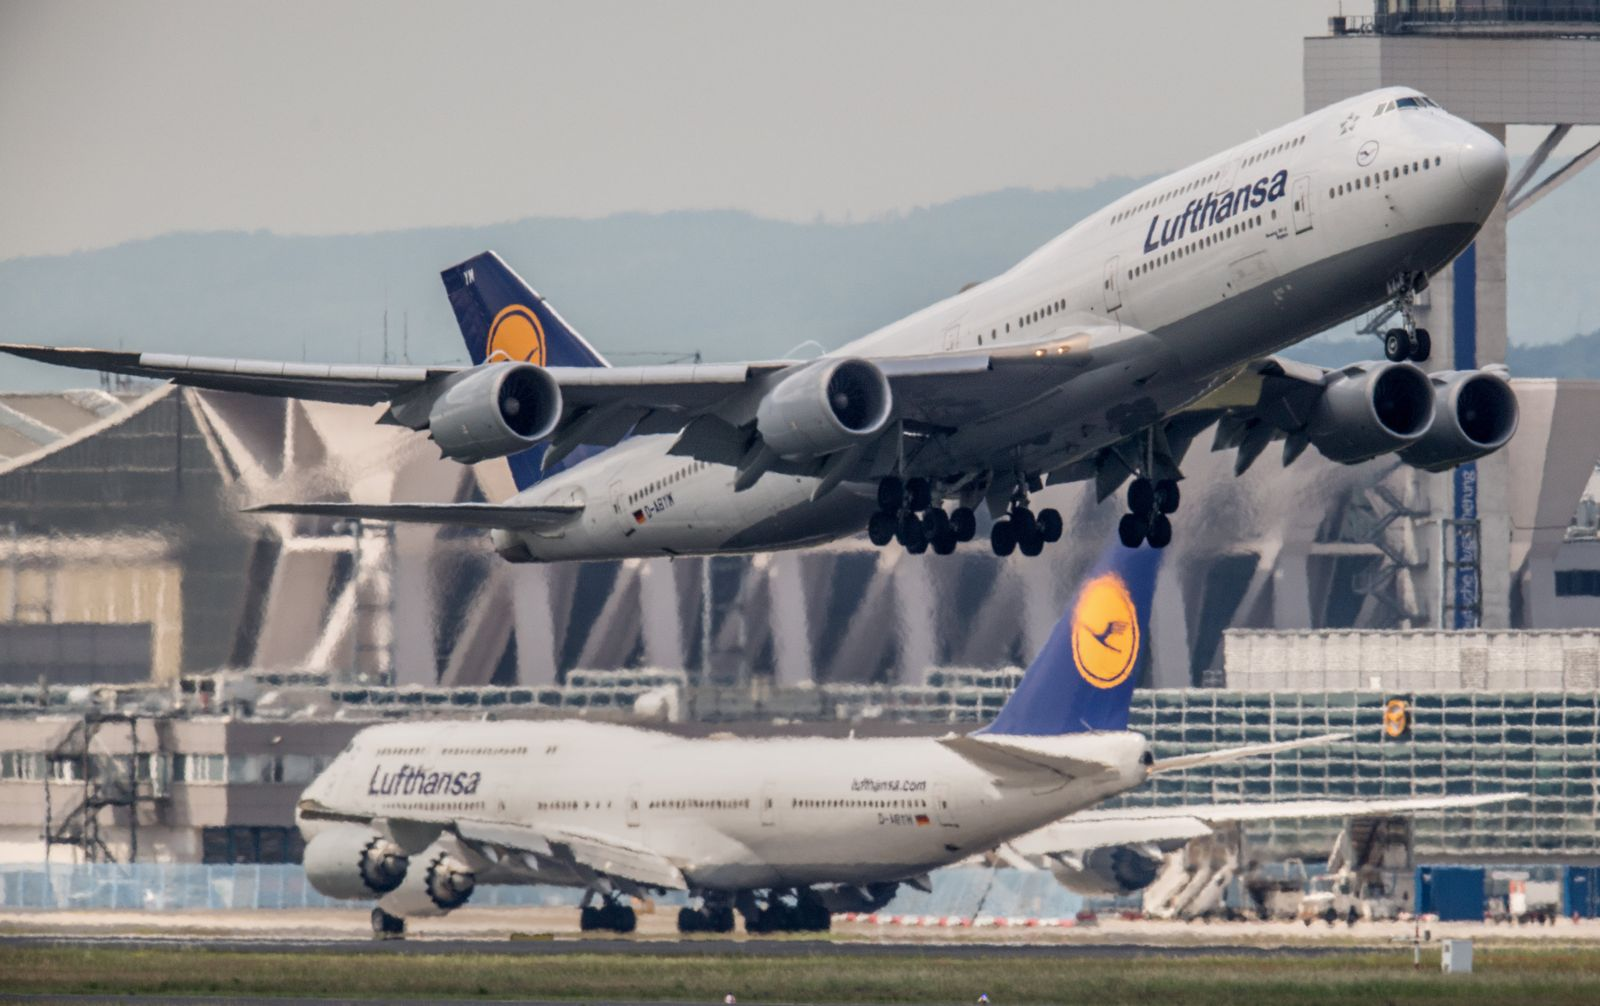 Flughafen Frankfurt Jumbo